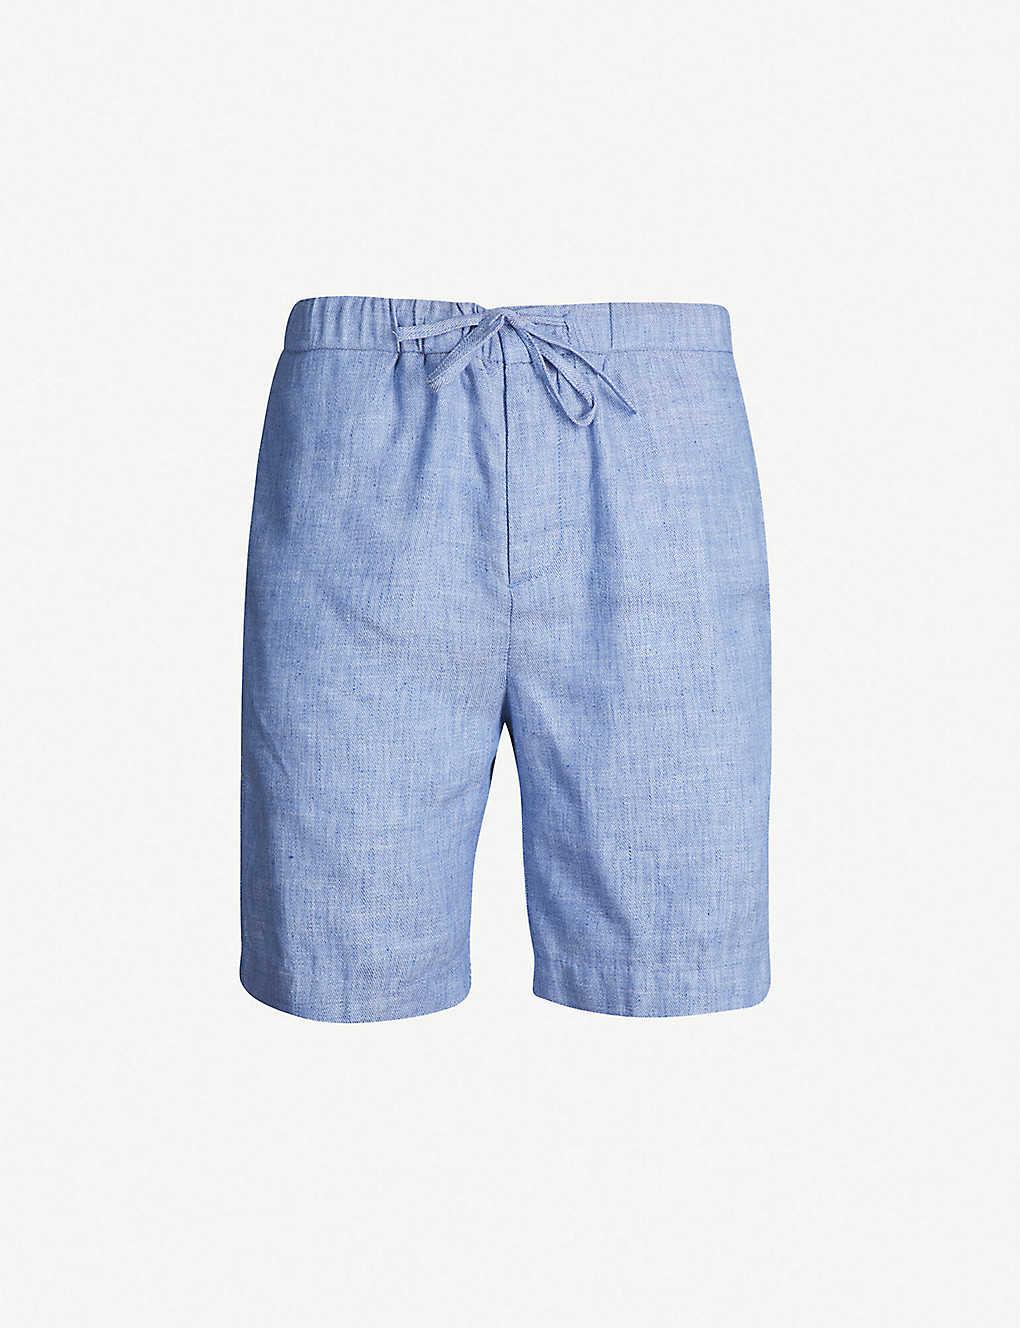 6d6e927d060ed FRESCOBOL CARIOCA - Sport linen-cotton blend shorts | Selfridges.com